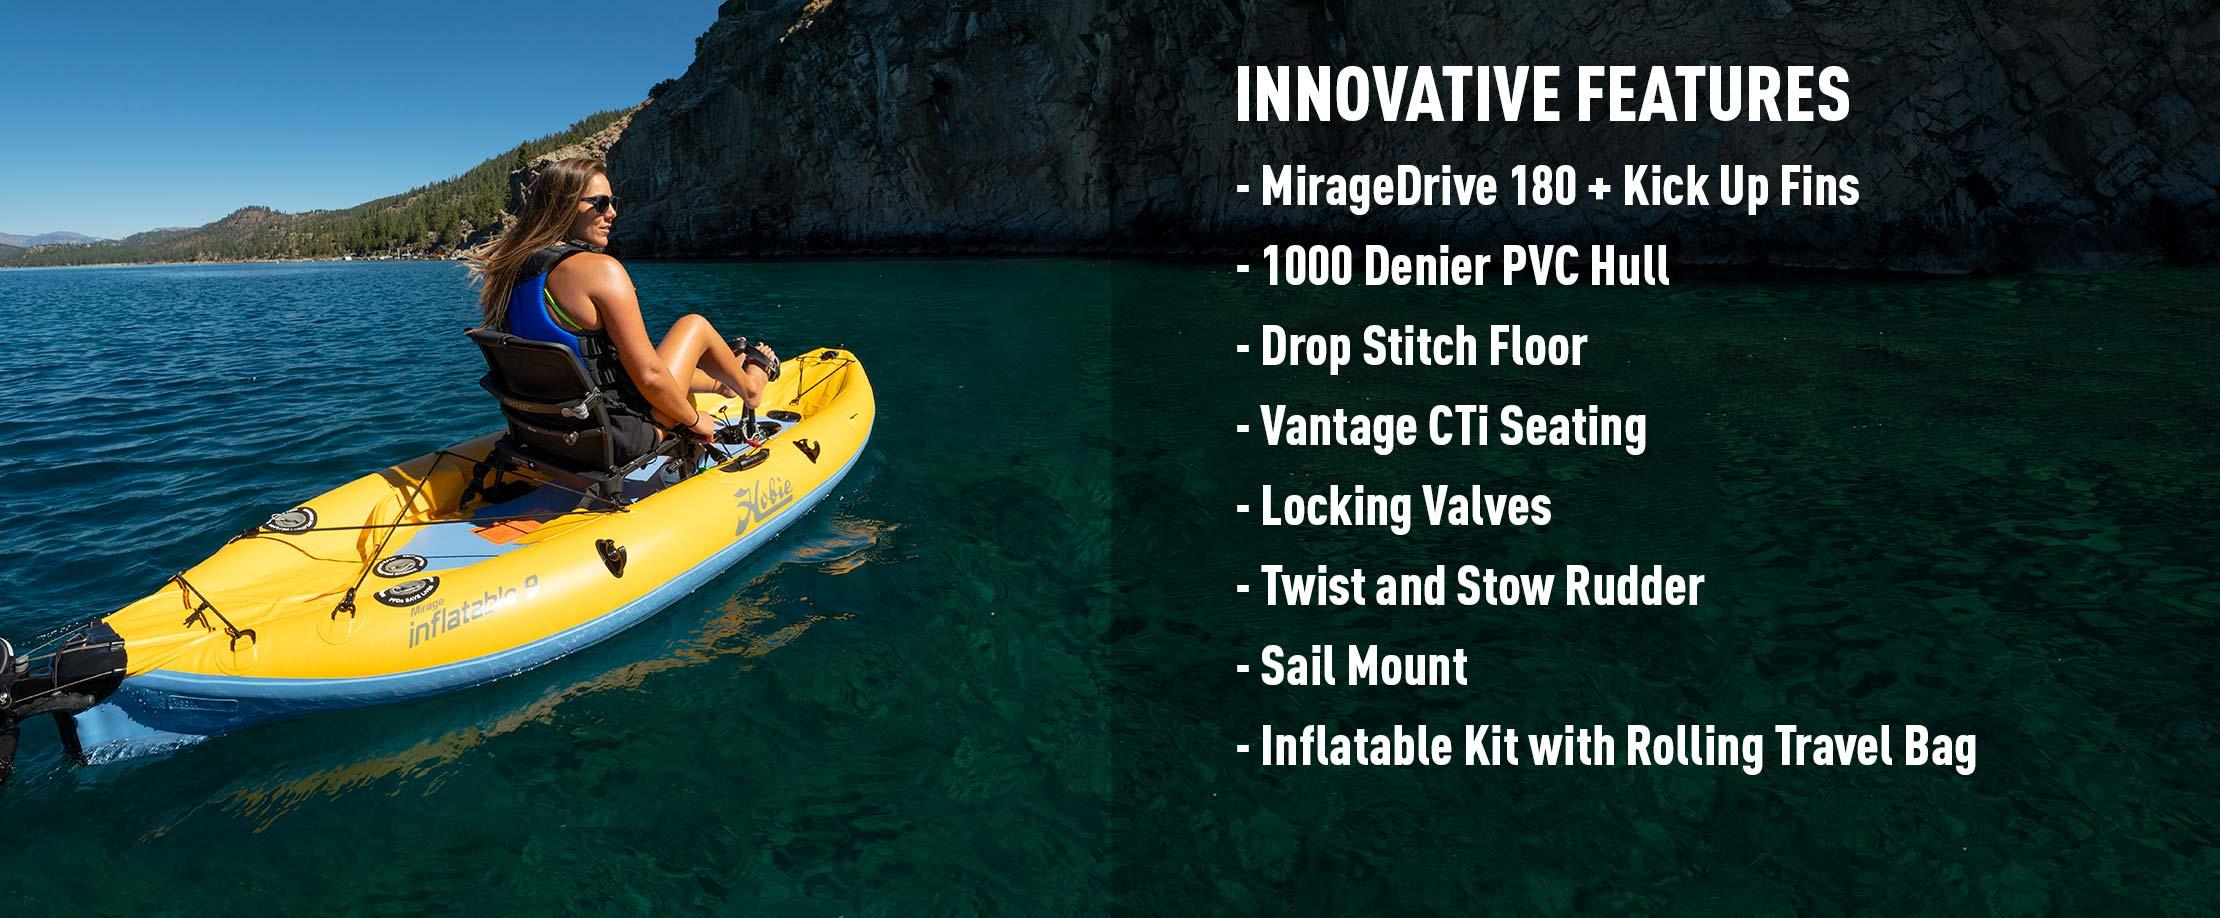 Mirage i9S Features